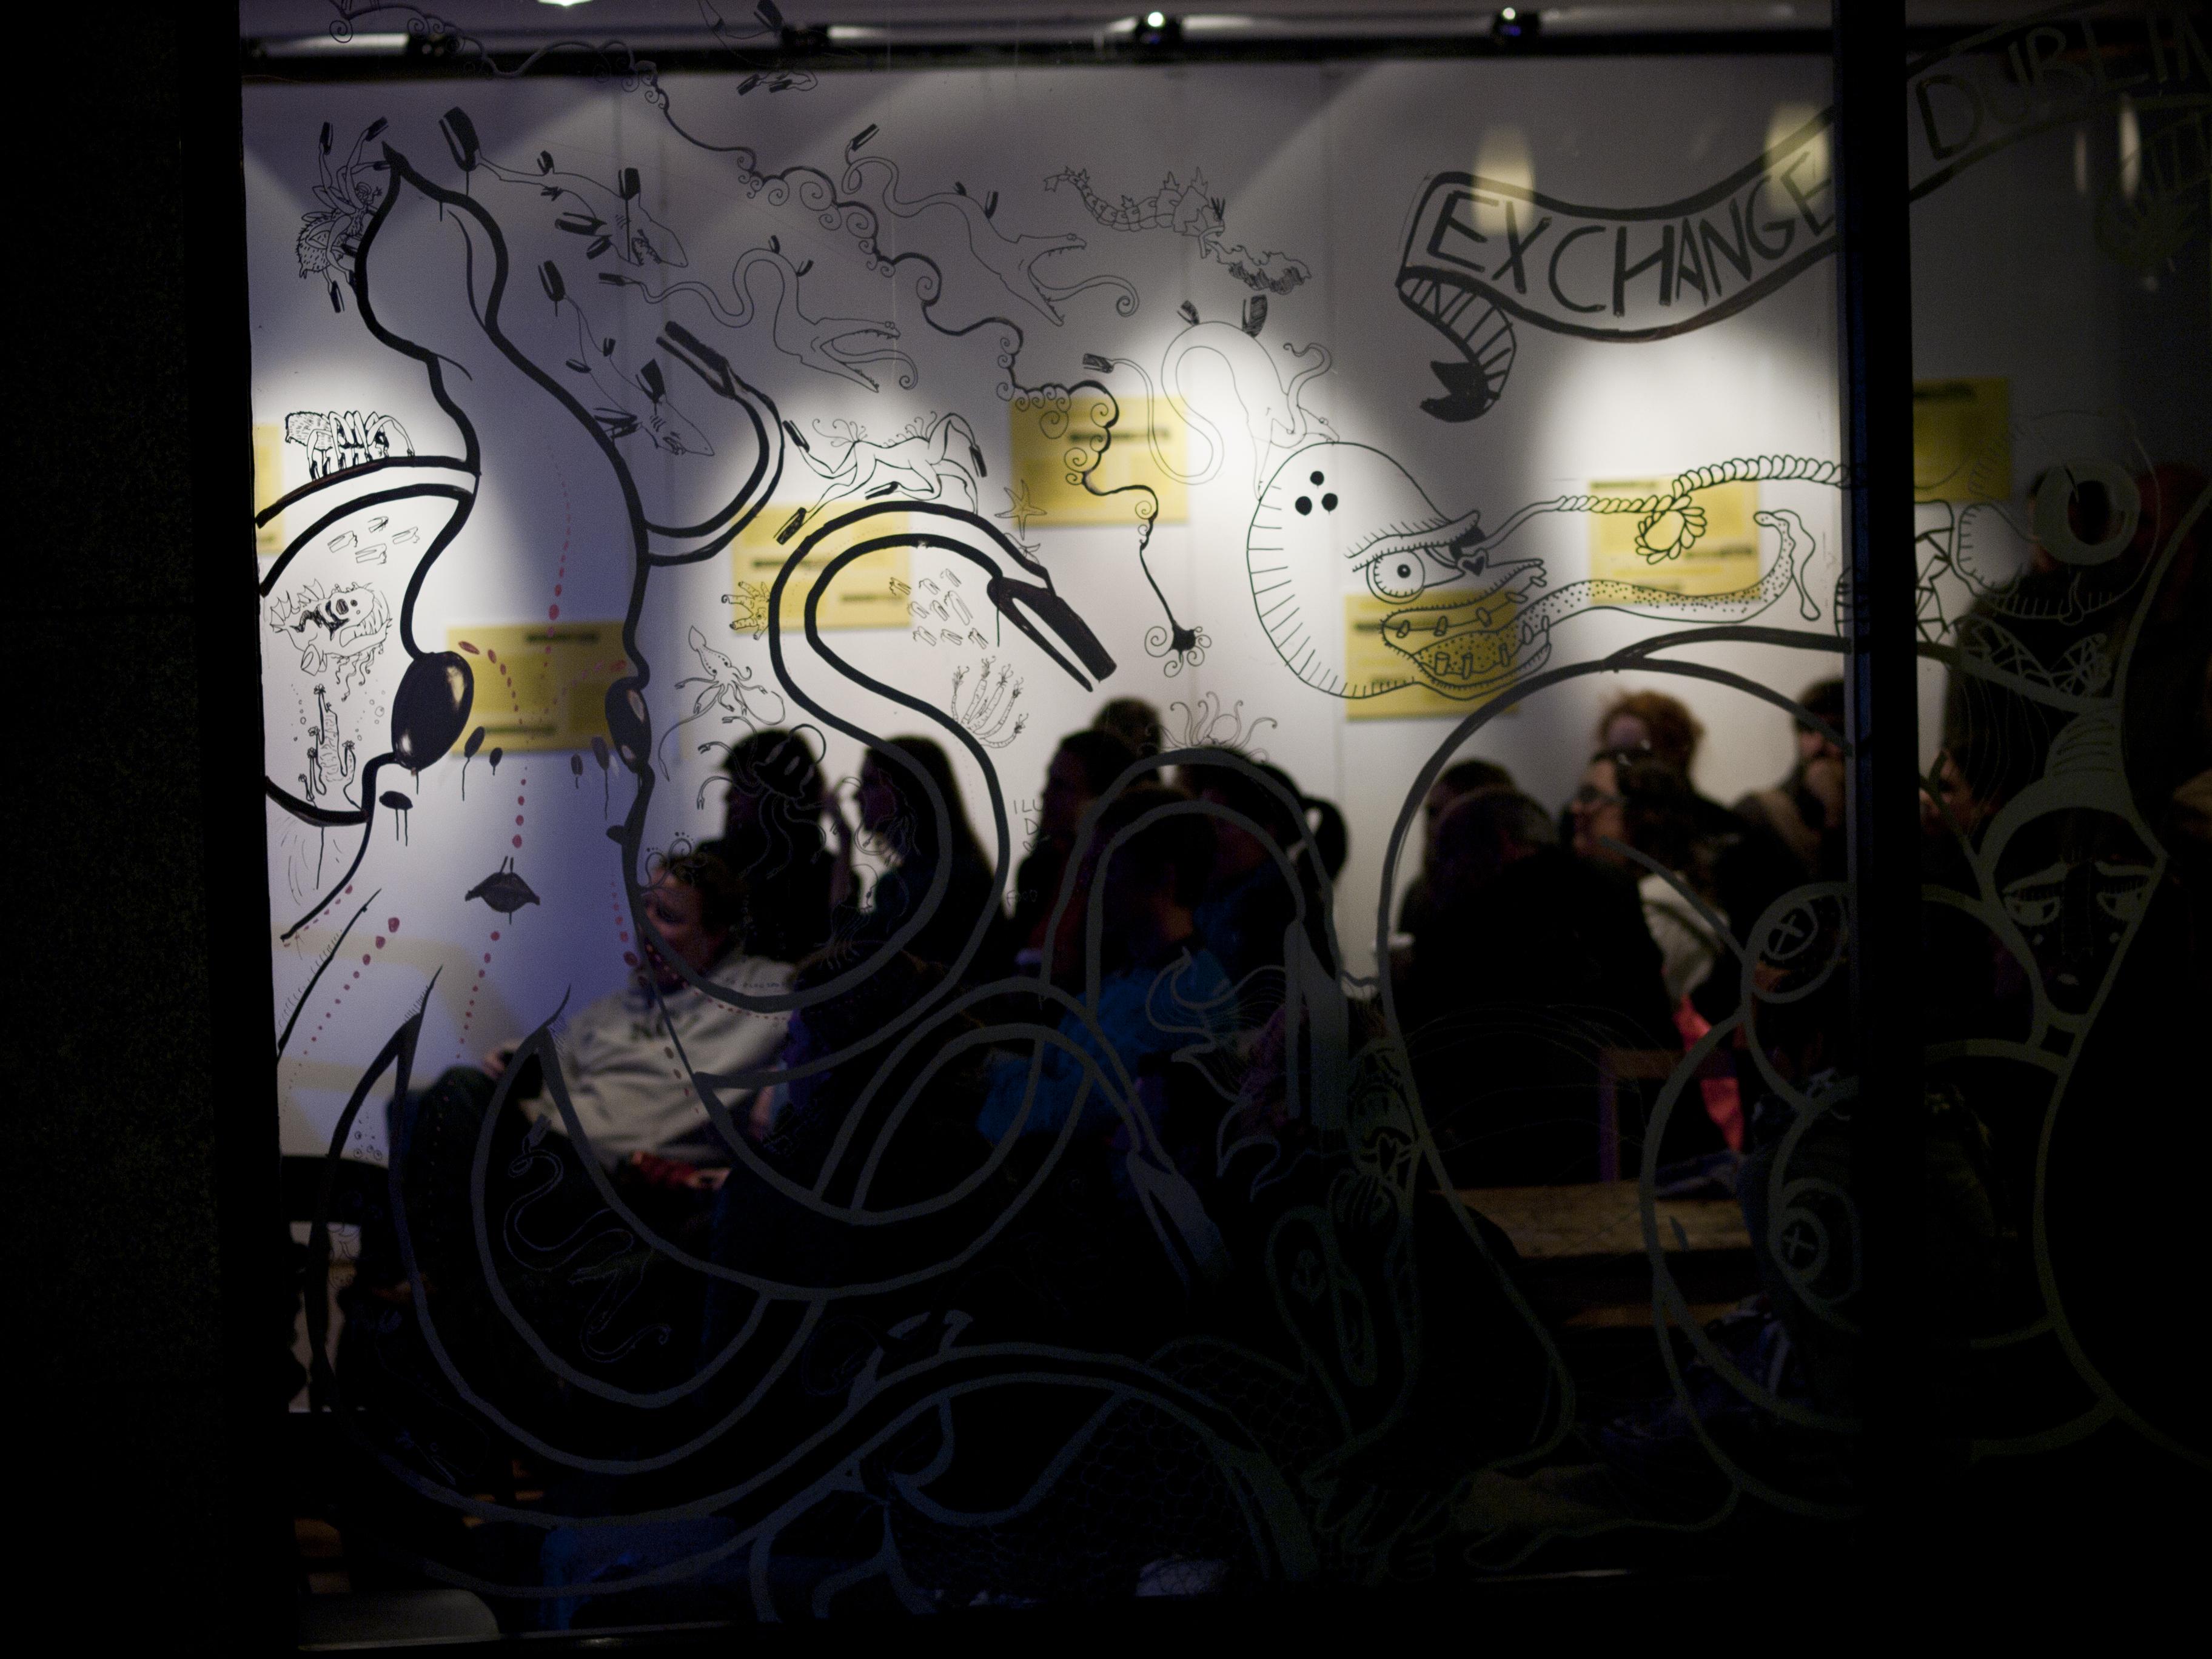 Culture Night Dublin, Indoor, HQ Photo